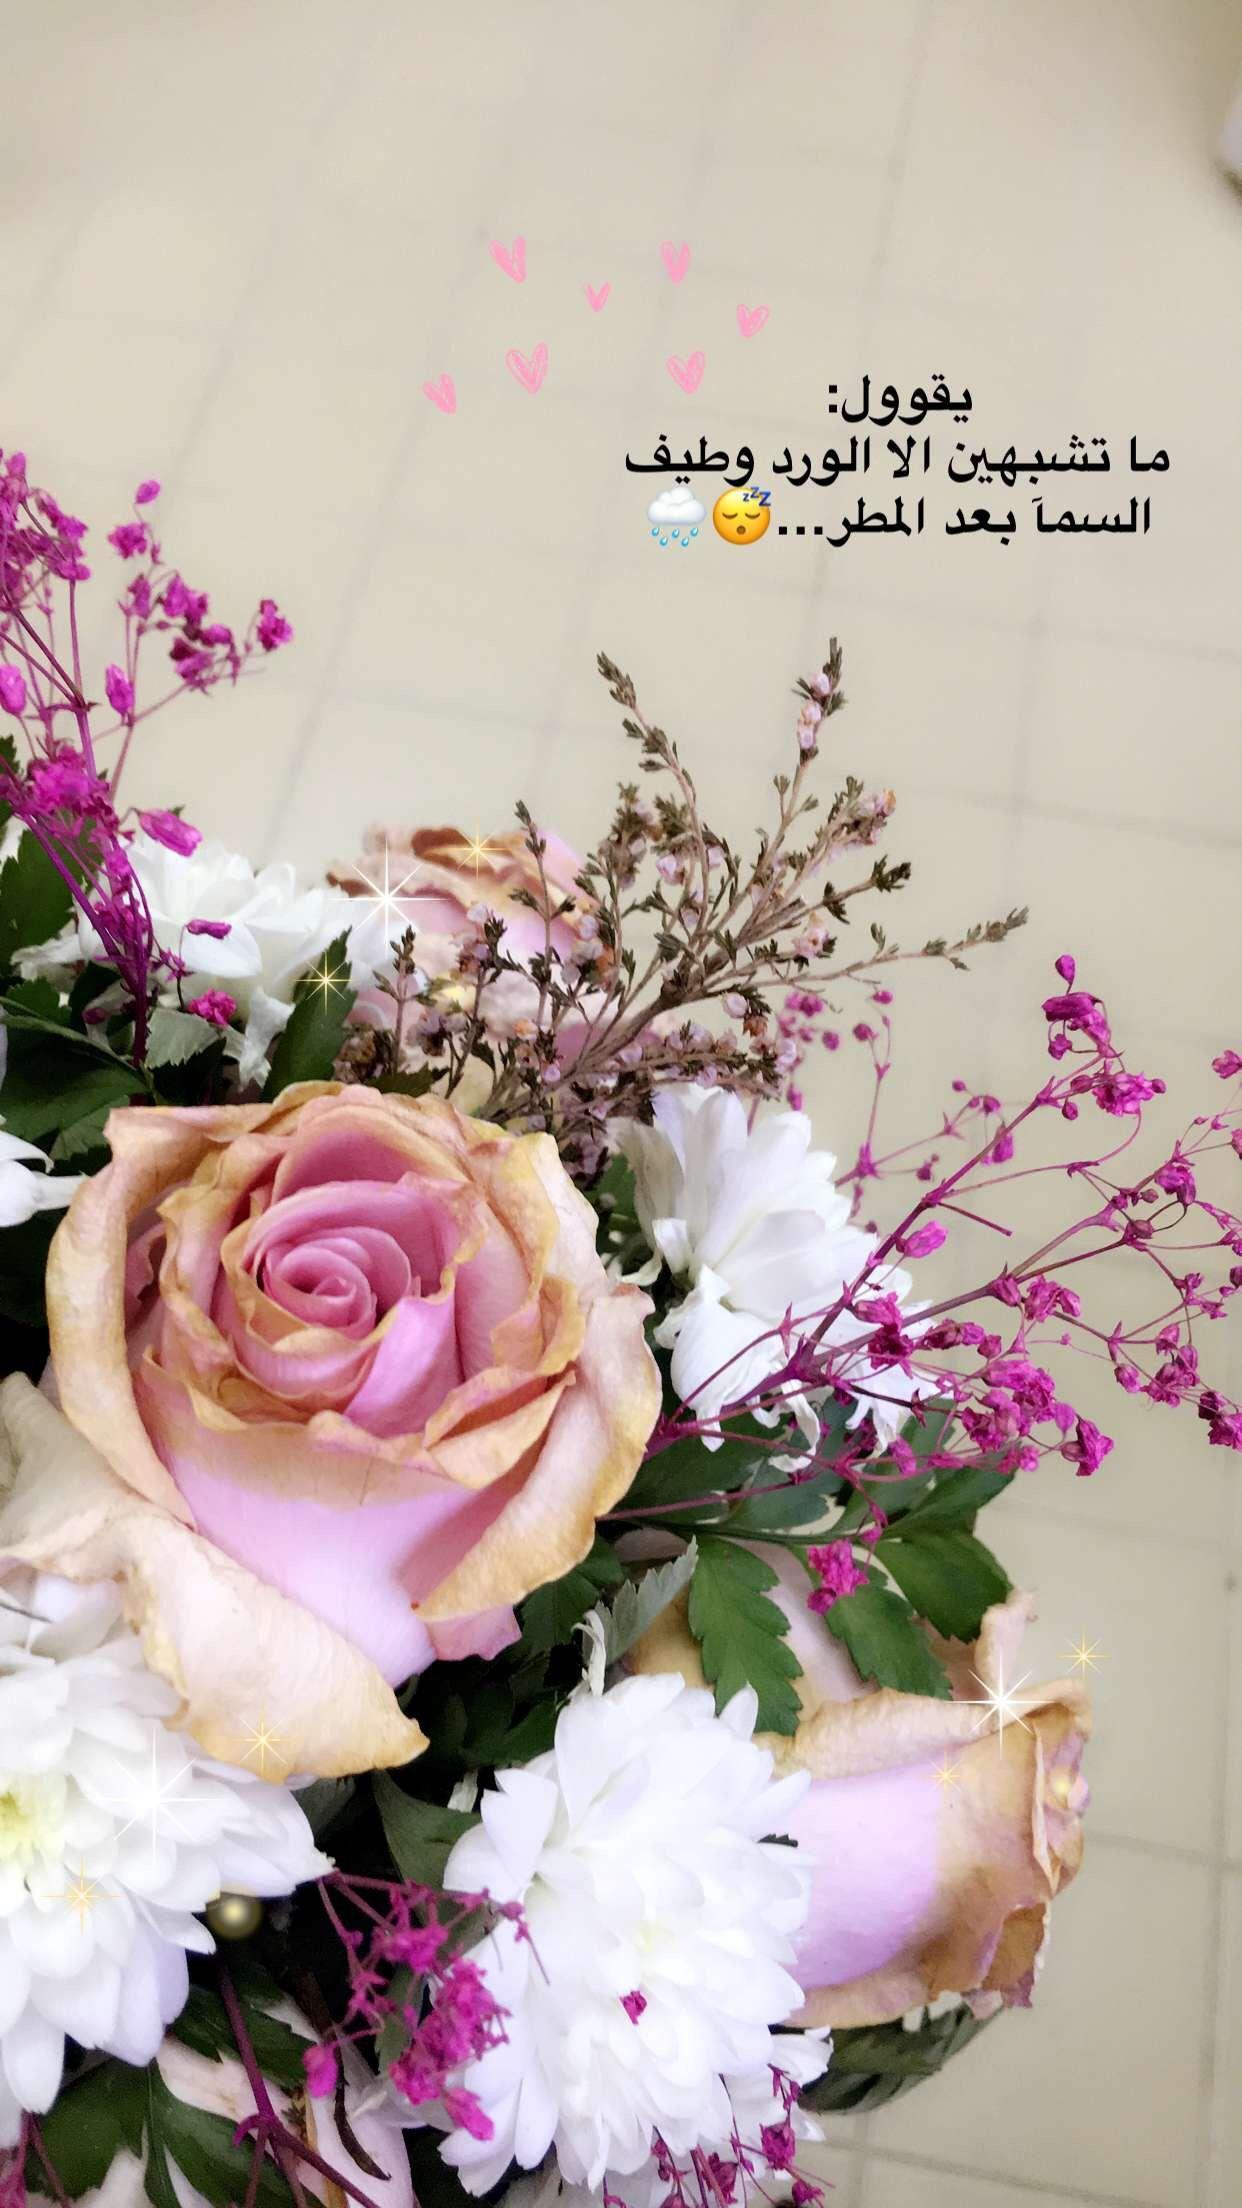 سناب سناباتي Image Quotes Photo Quotes Arabic Quotes